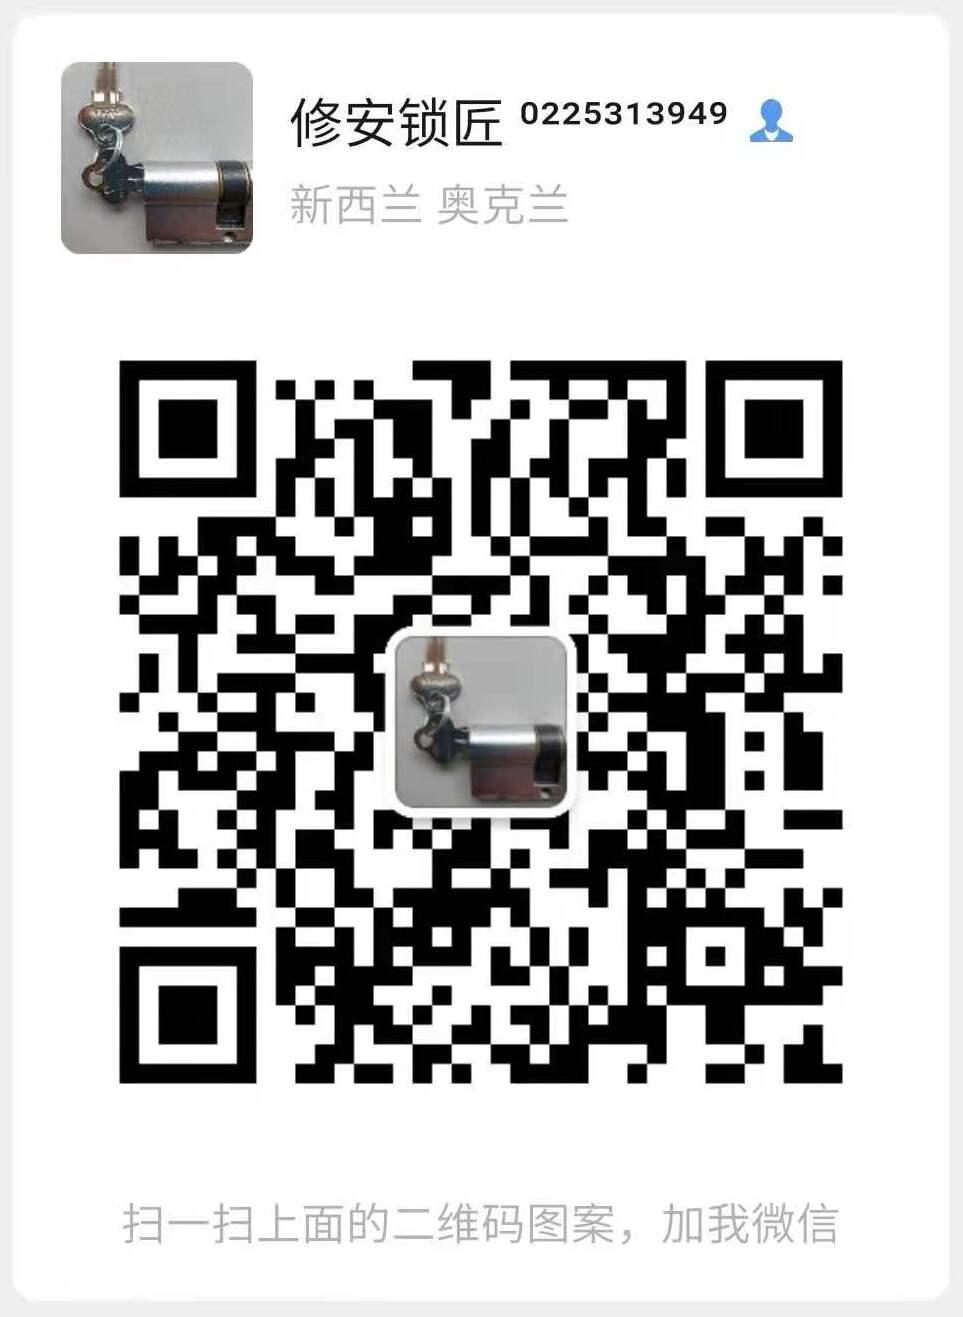 741780467085098